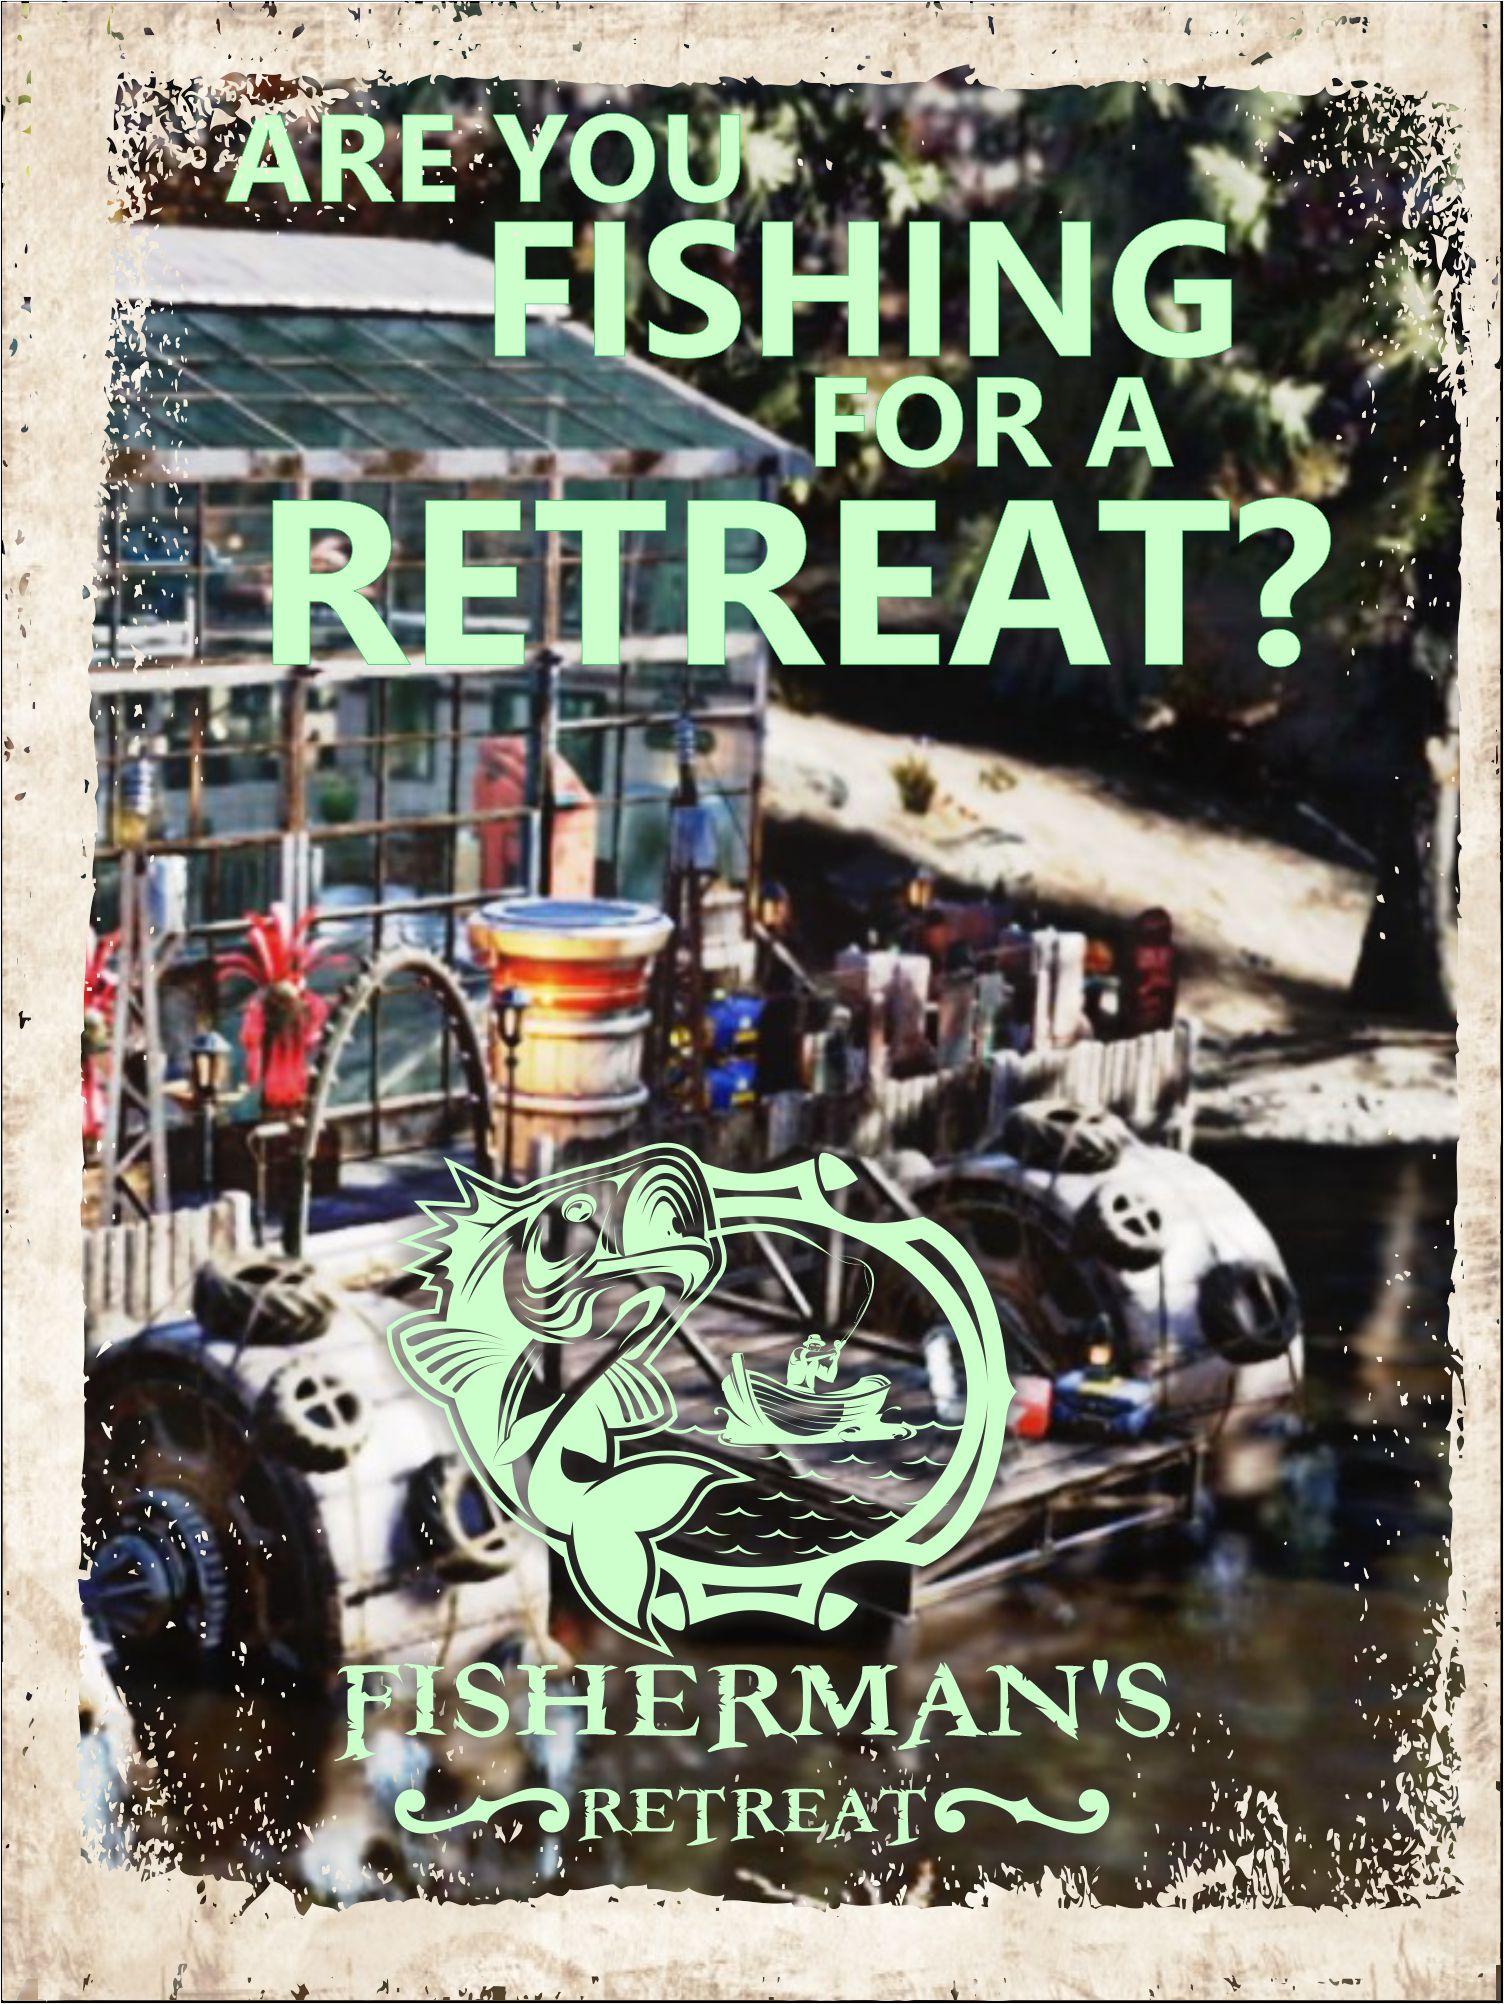 Fisherman's Retreat